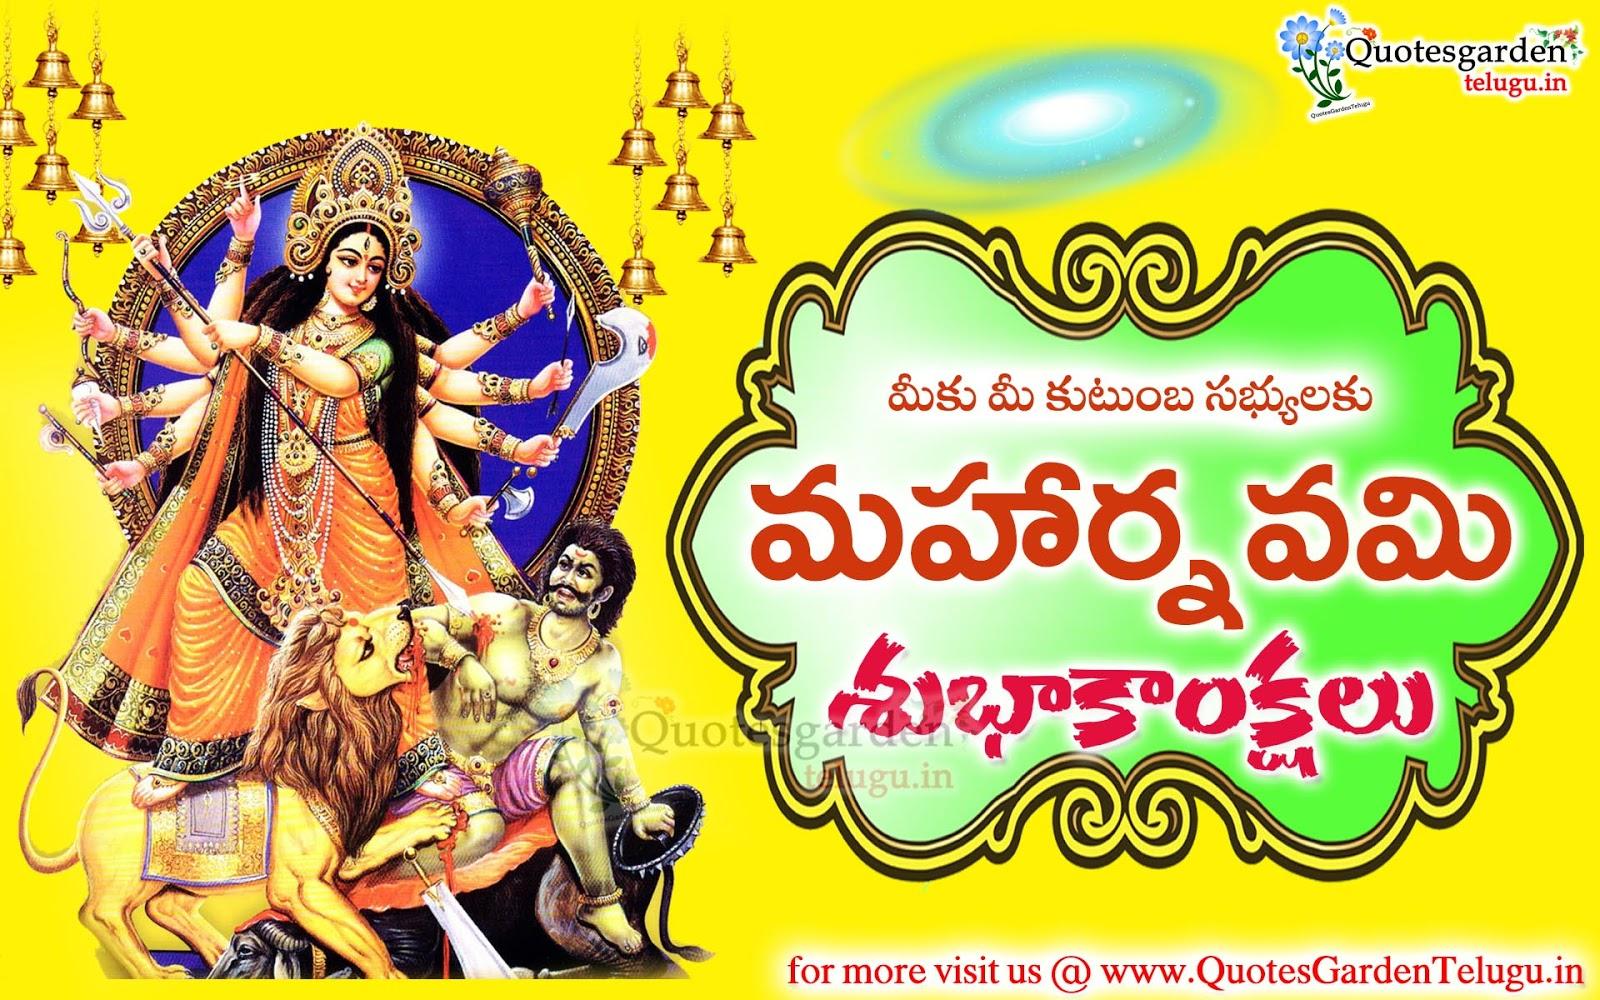 Maharnavami Ayudhapuja Dussehra Telugu Greetings Wishes Hd